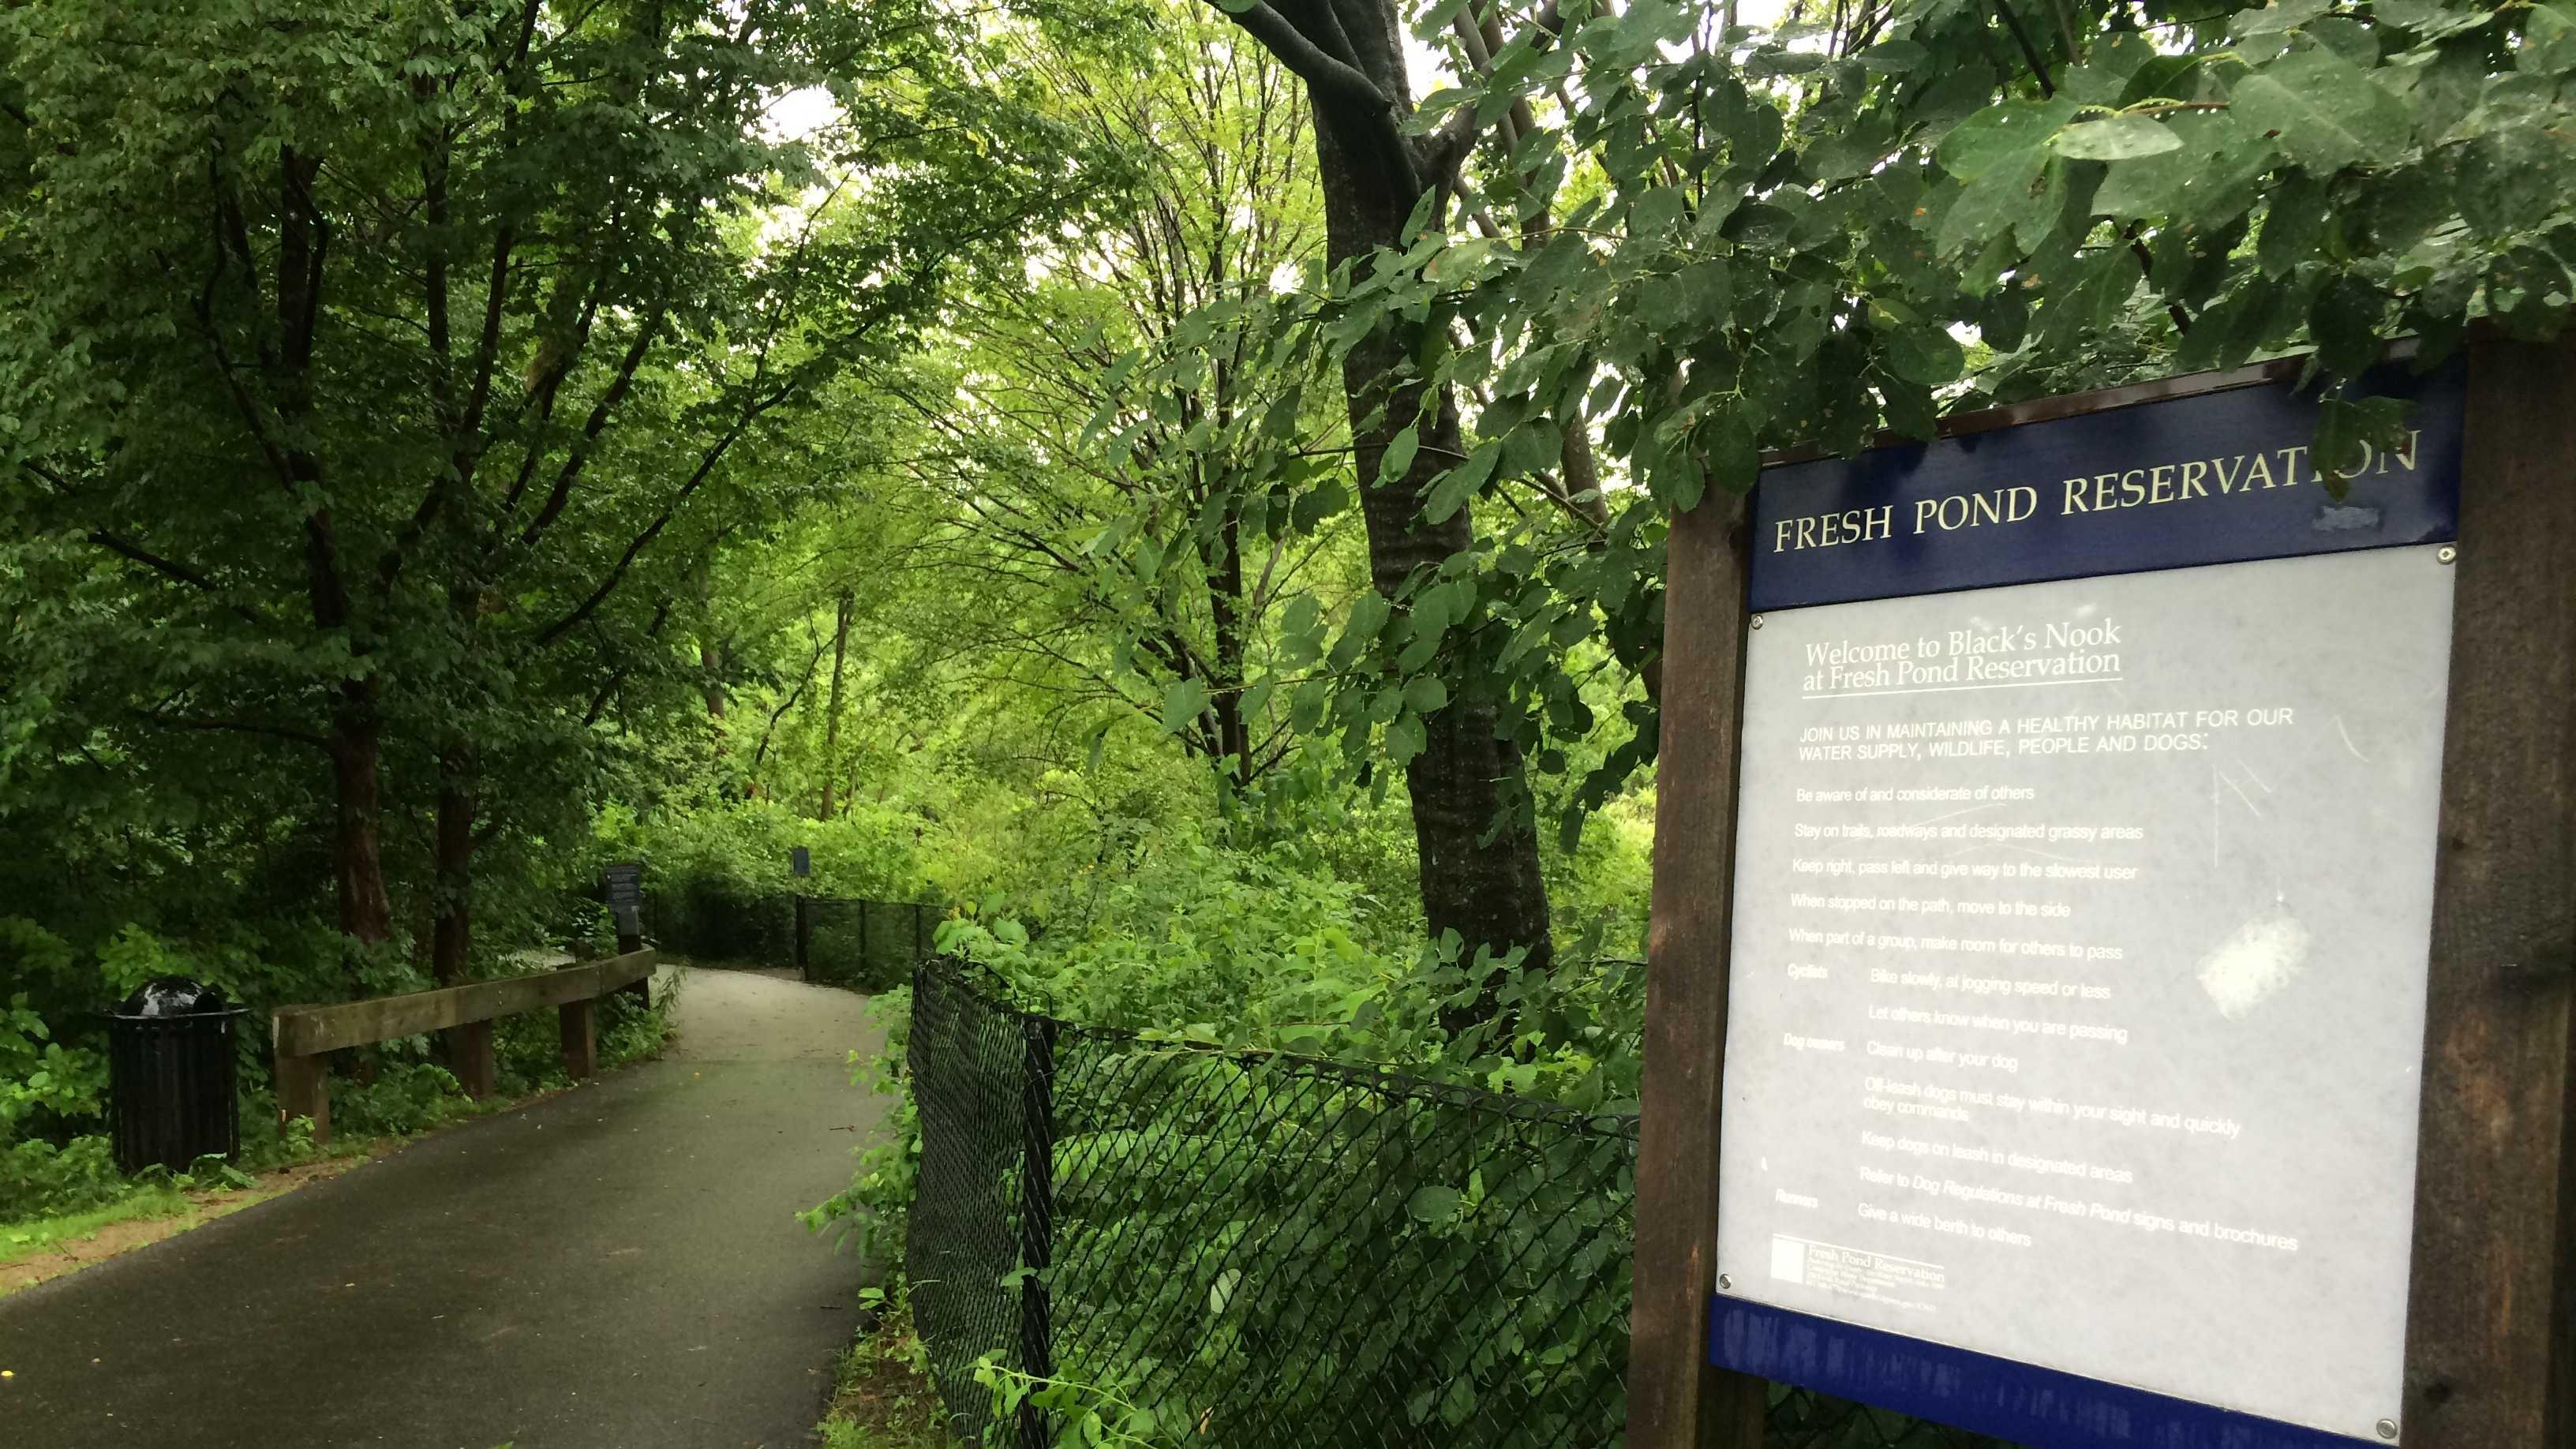 Cambridge walking path